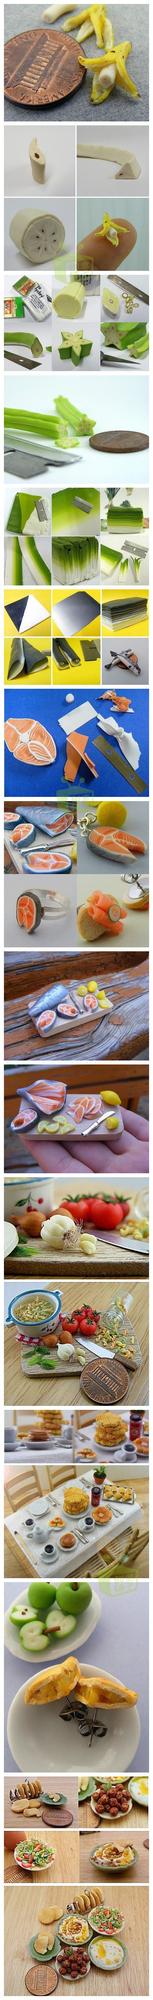 The Cutest Miniature Food